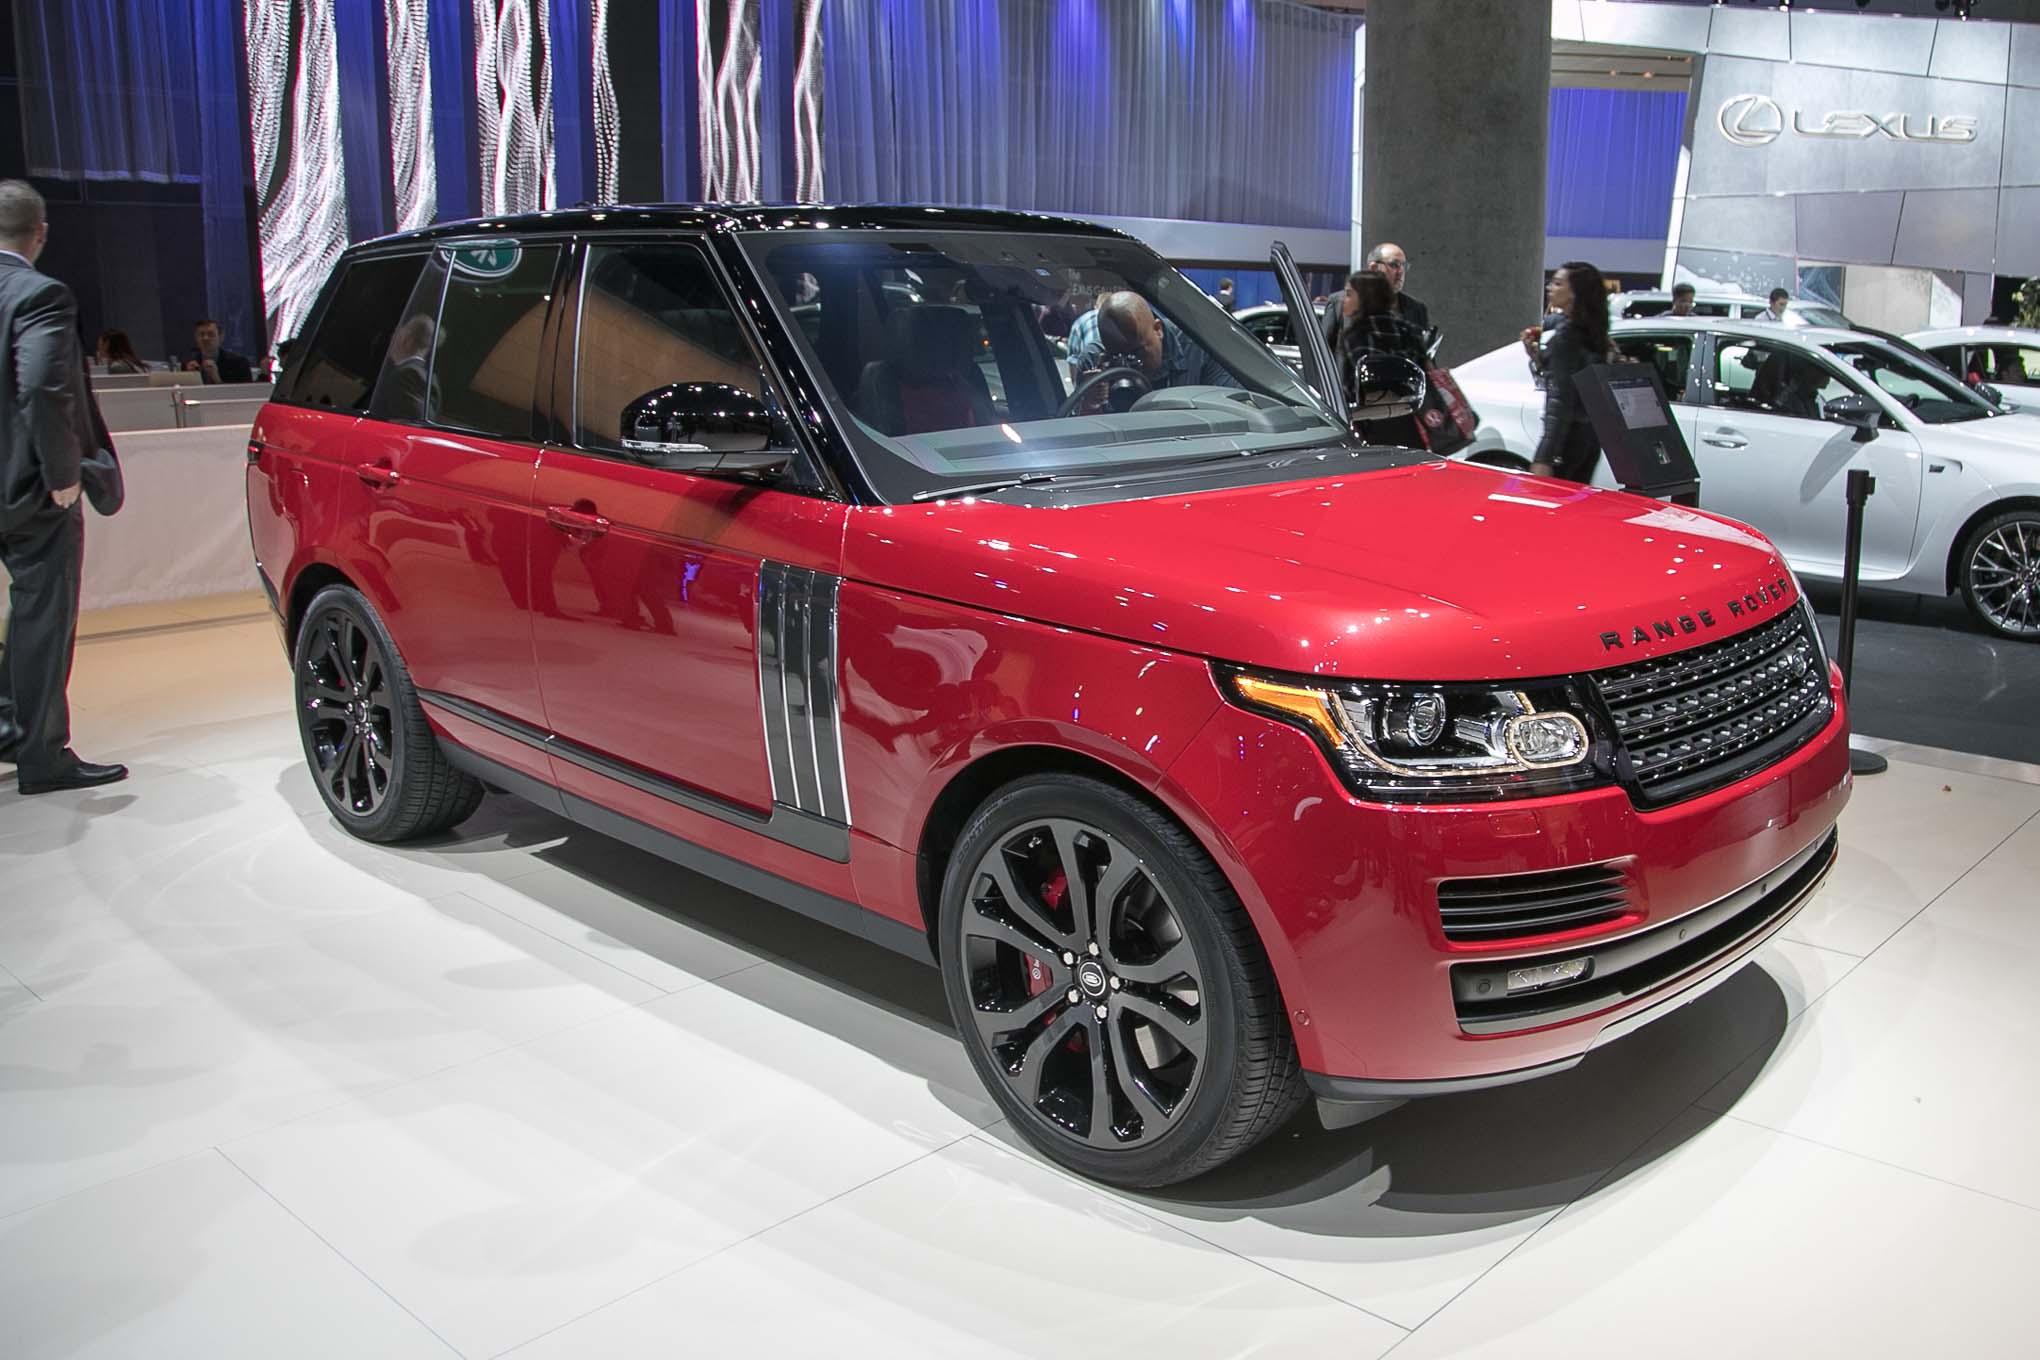 2018 Range Rover SV Autobiography Dynamic >> 2017 Range Rover Svautobiography Dynamic First Drive Review